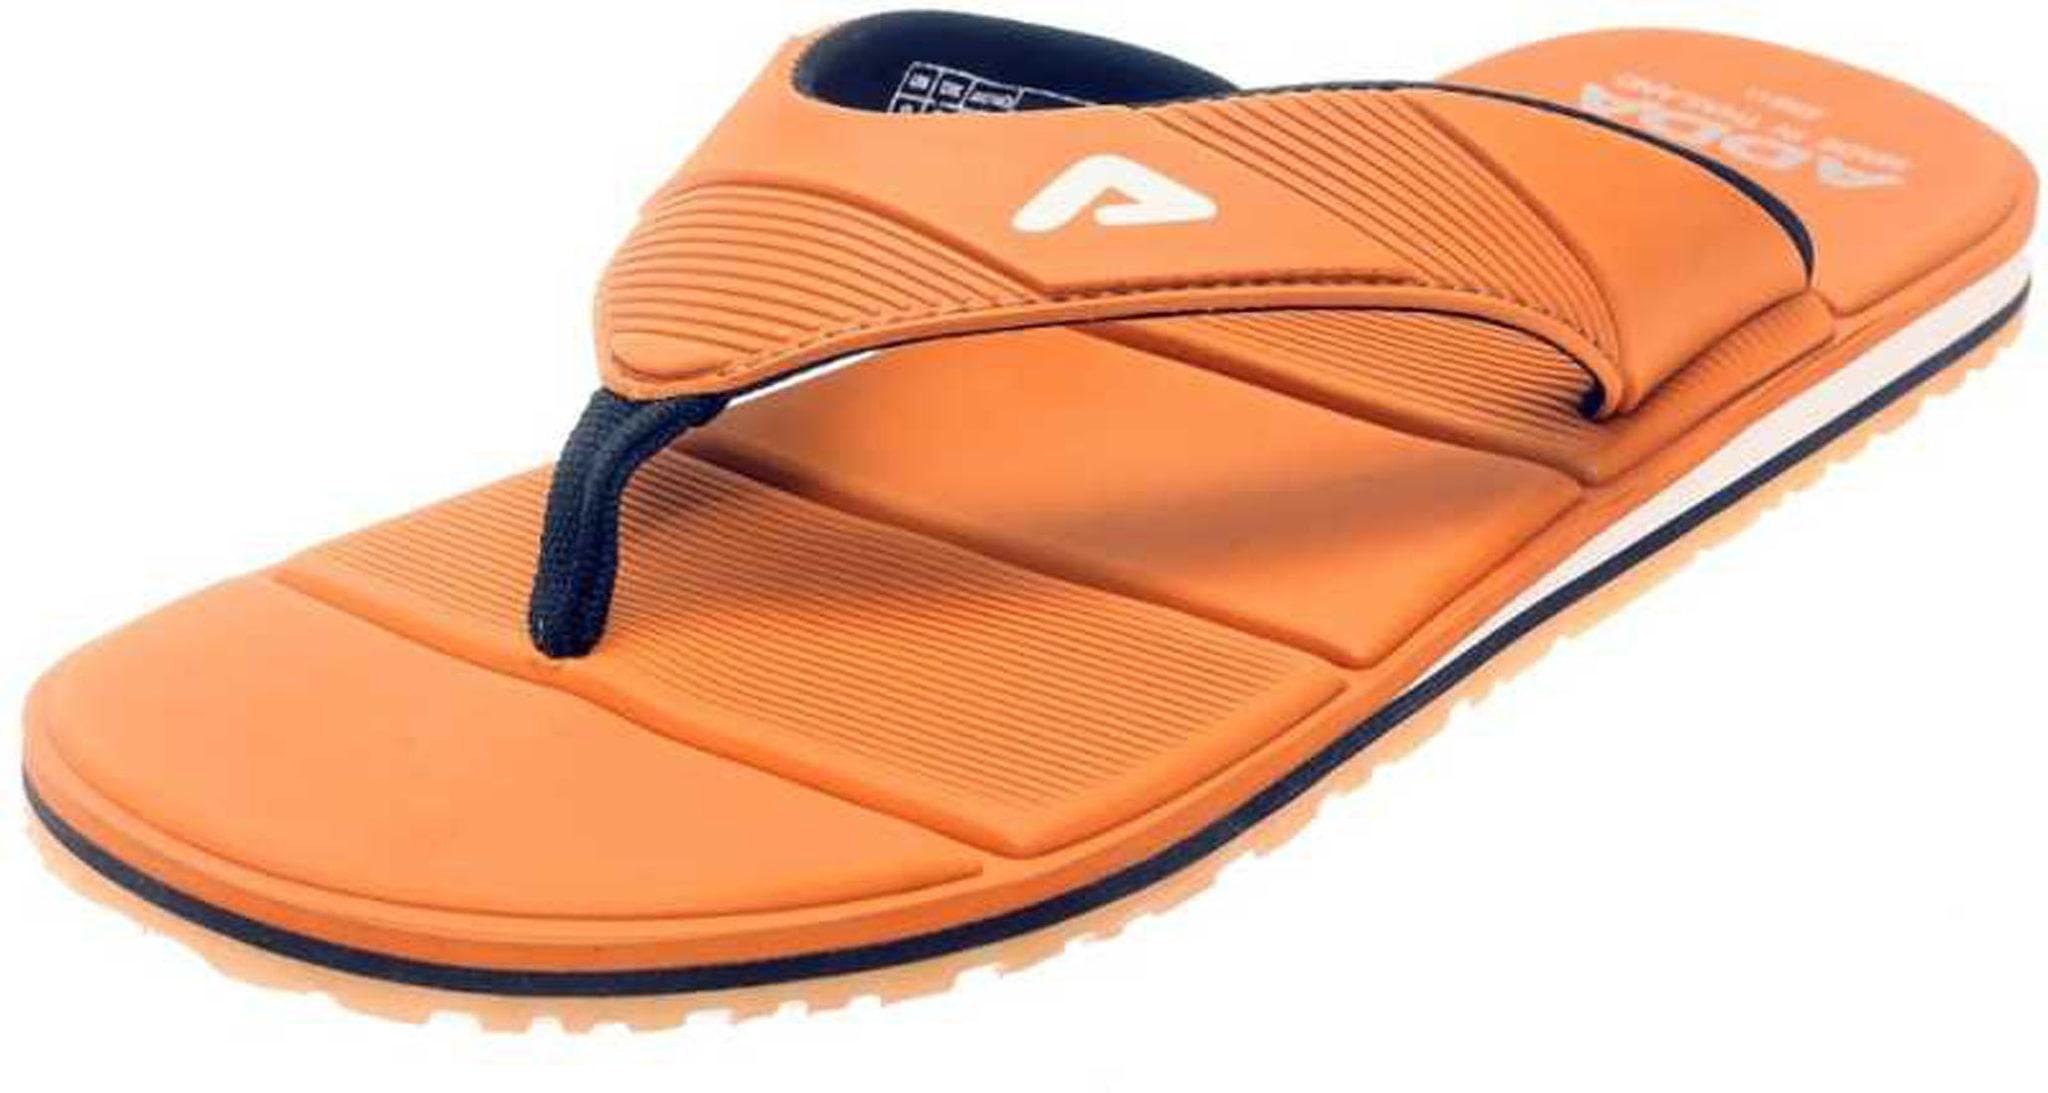 ba831d832f30b8 ADDA Slippers   Flip Flops Prices